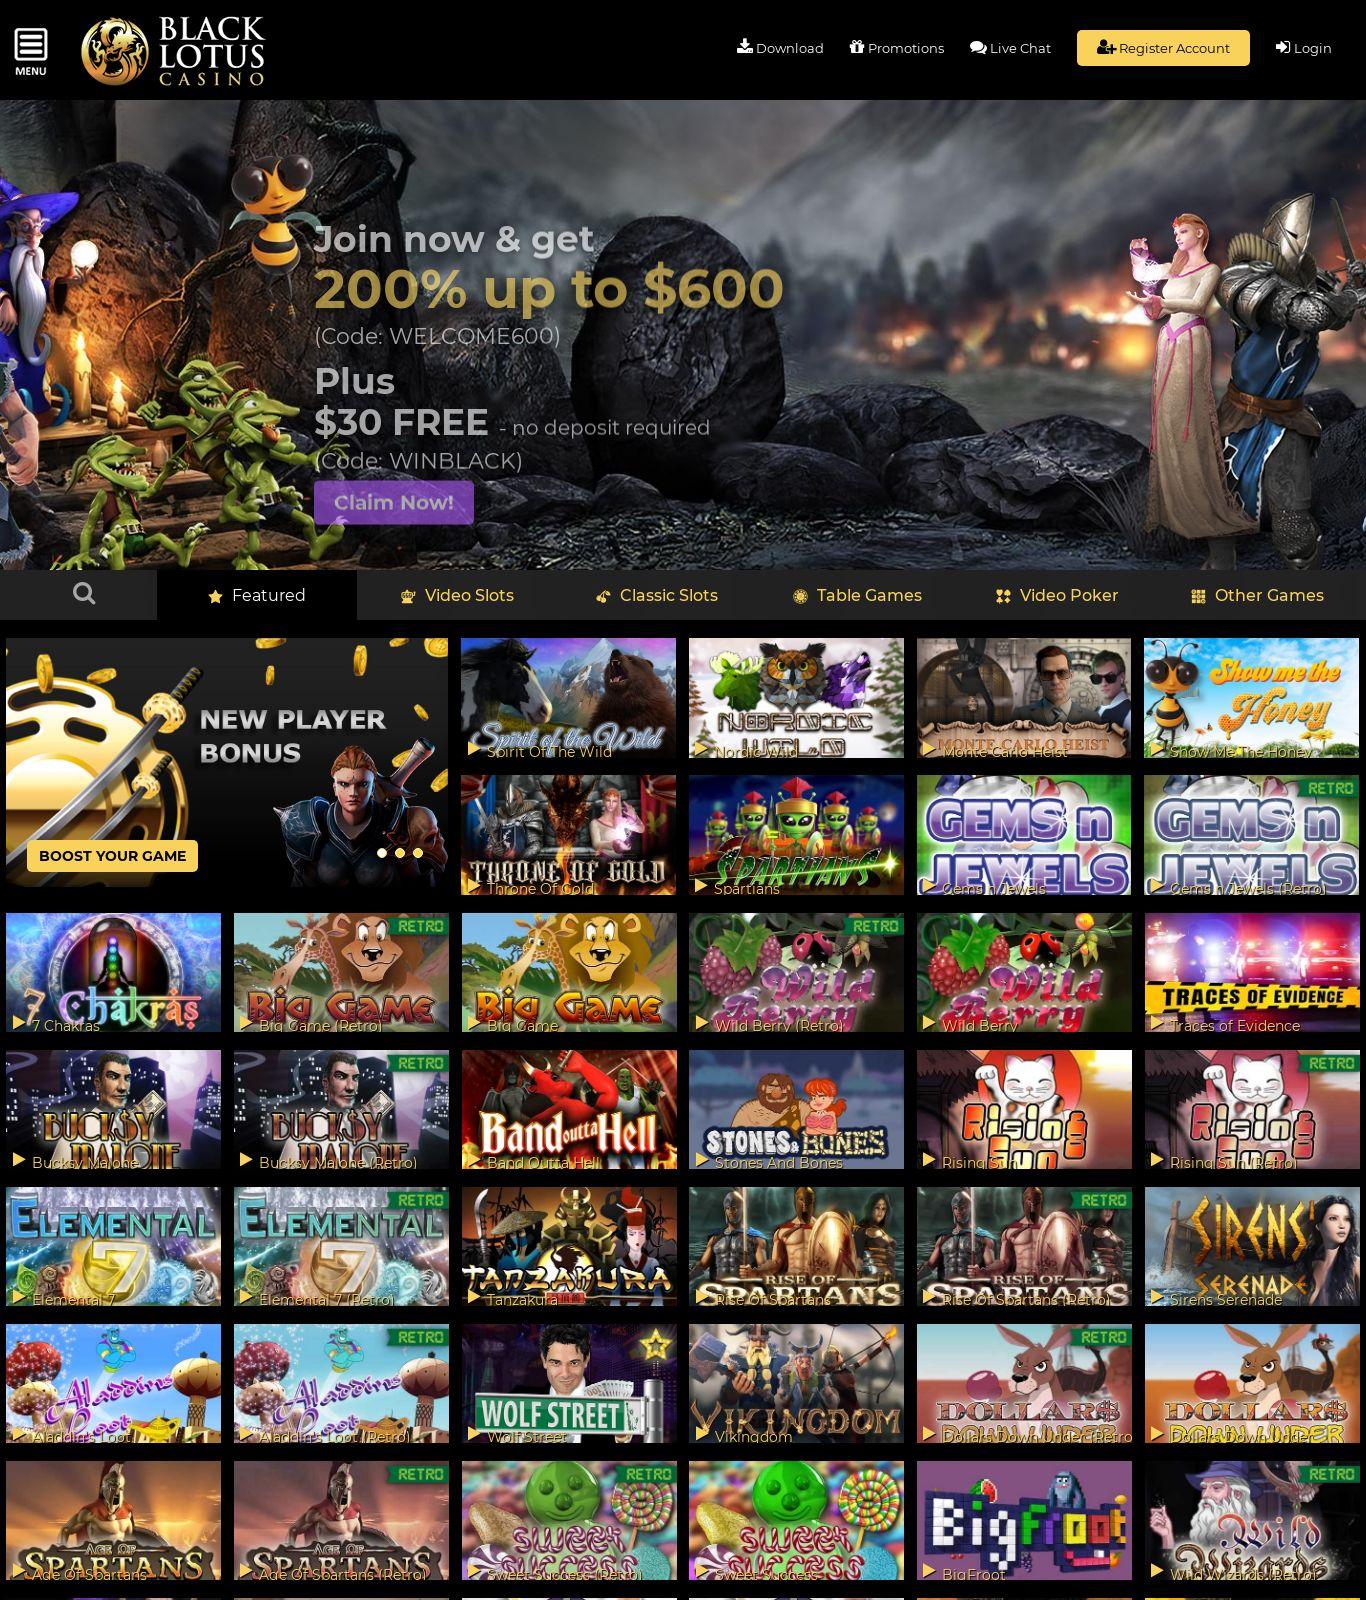 Black Lotus Casino Review Scam Report Blacklotuscasino Com May